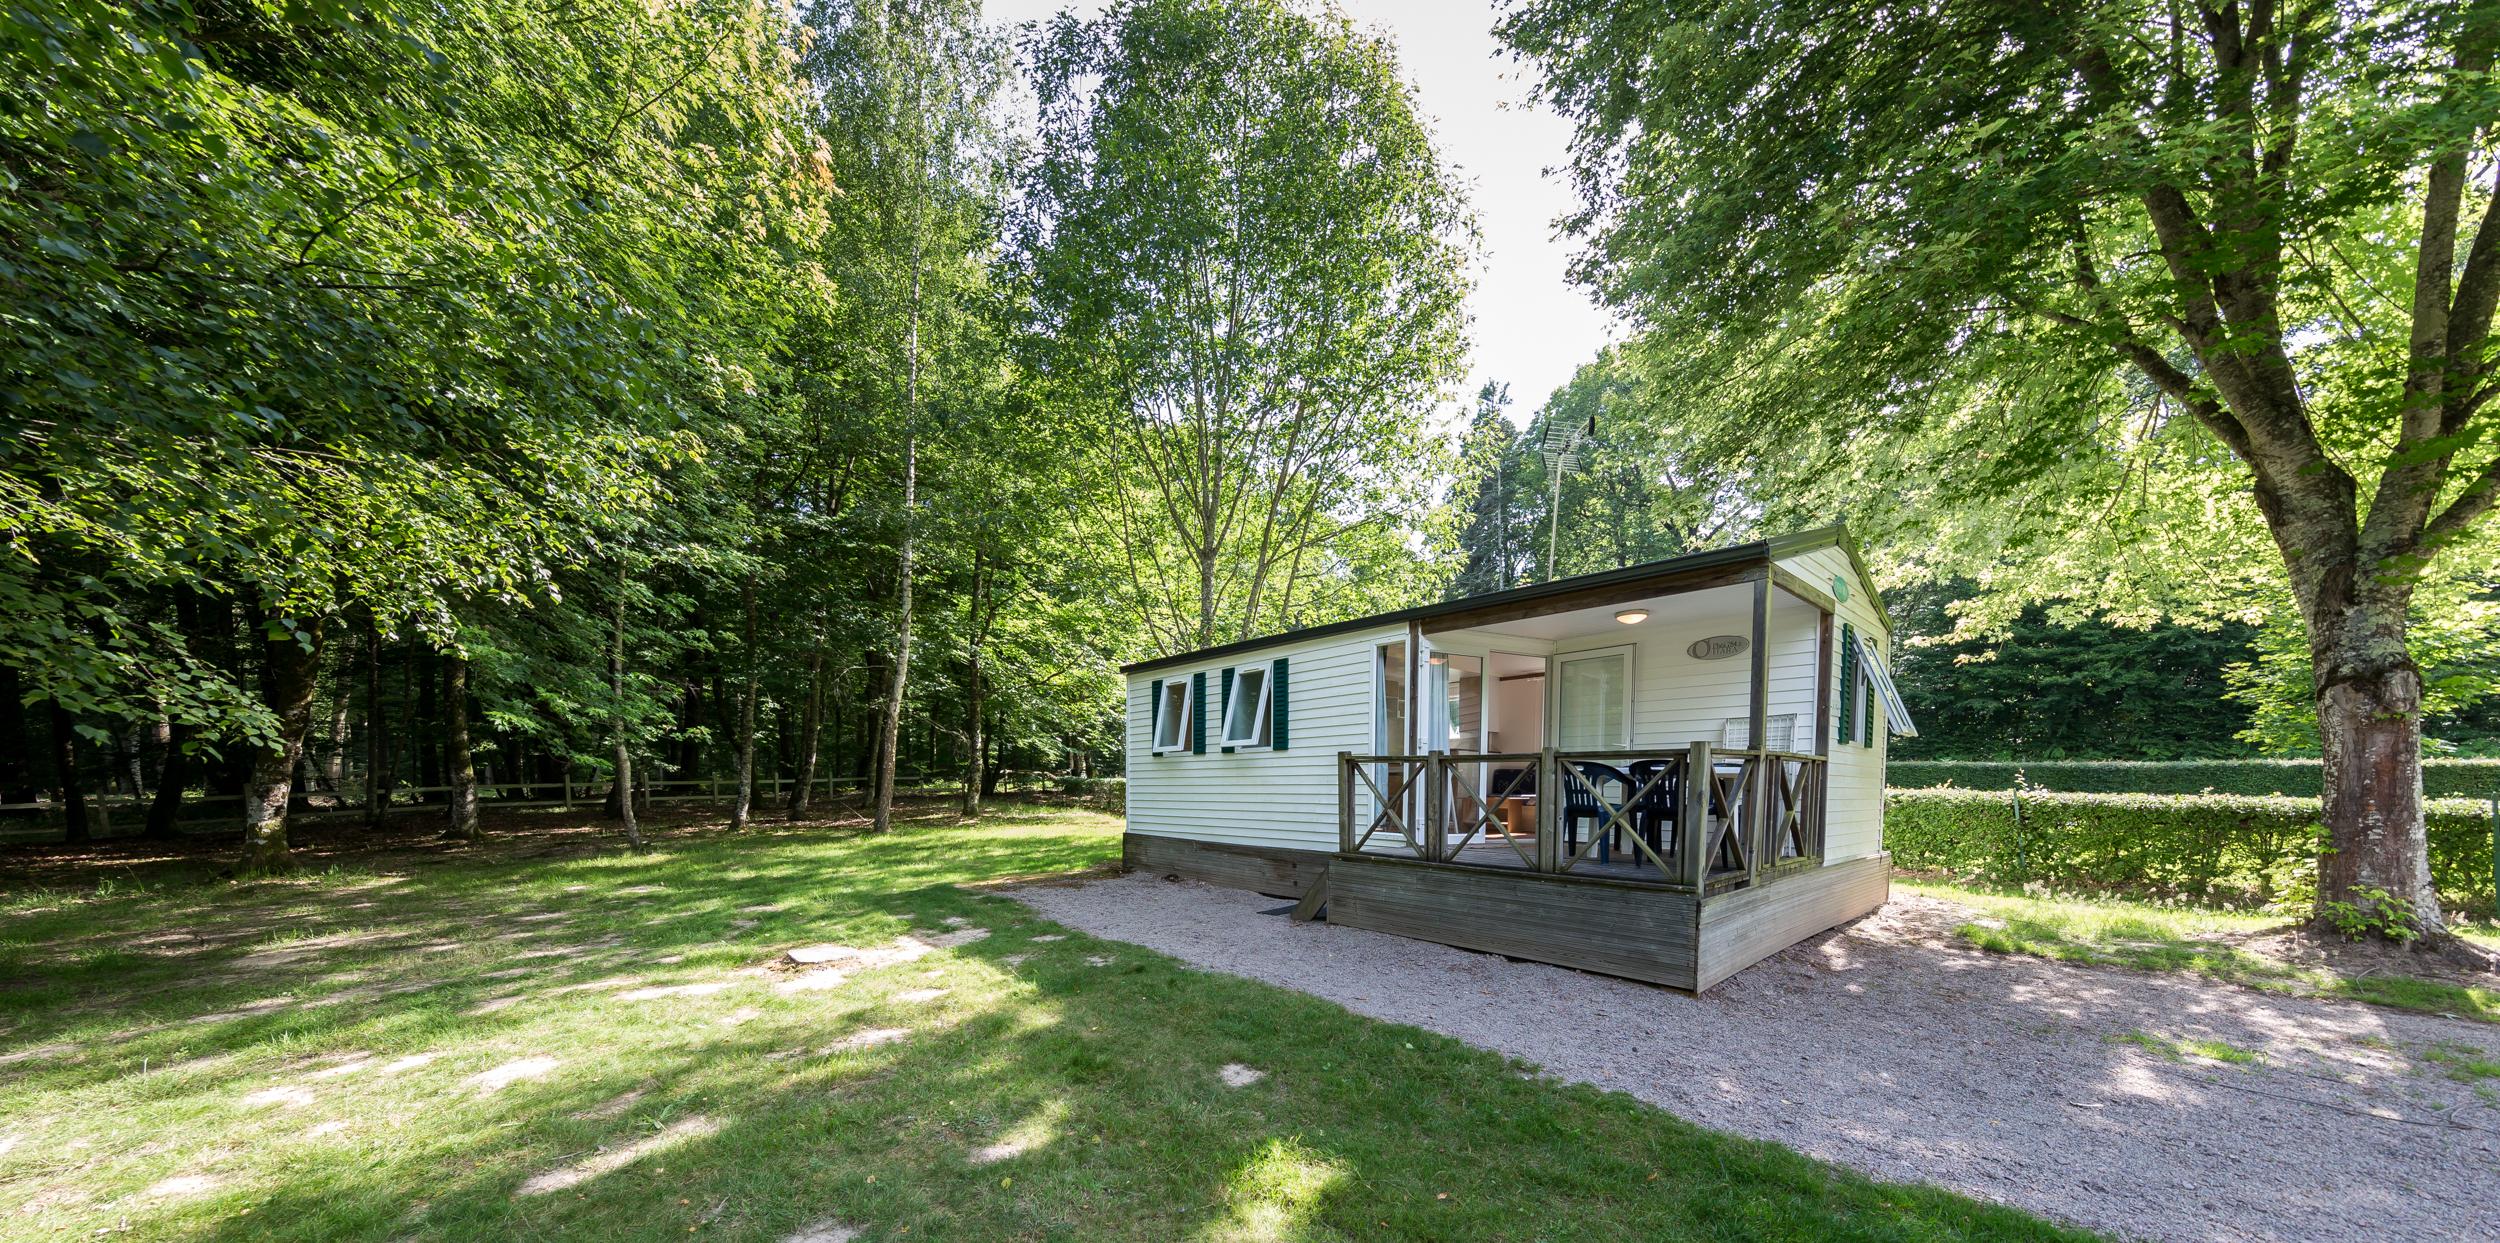 Camping des Écossais Bungalow Ⓒ Camping des Écossais - 2018